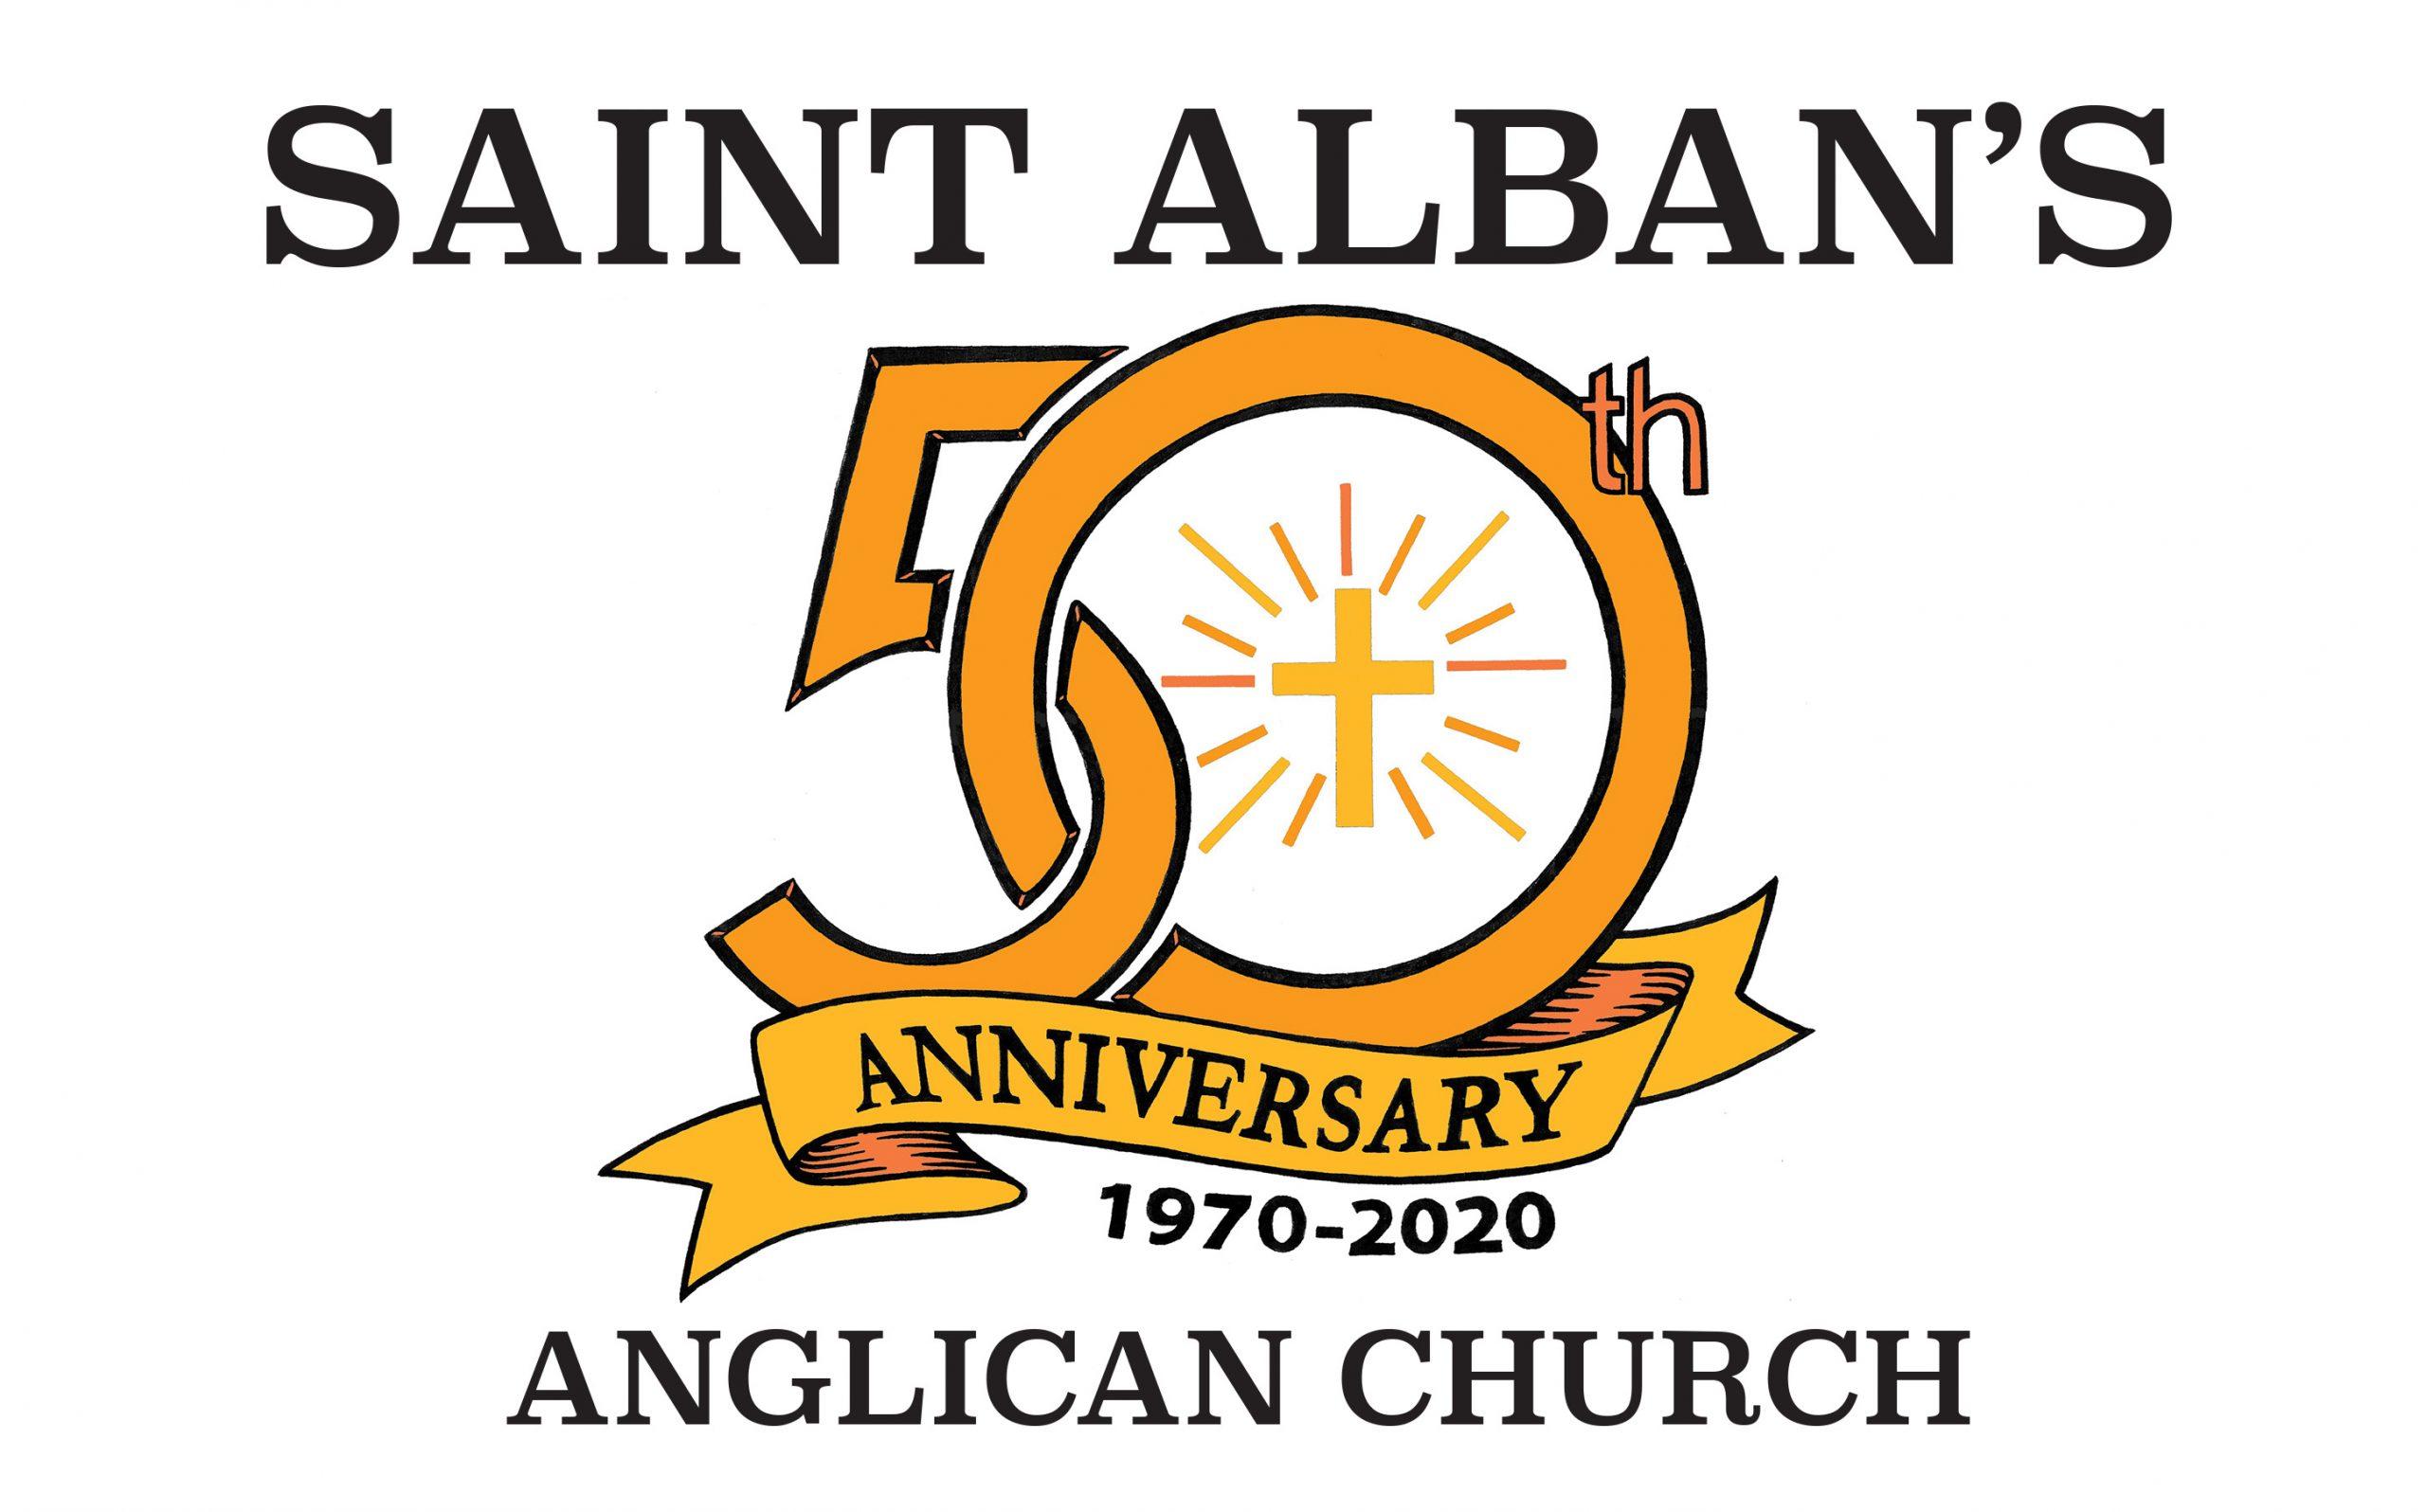 SAINT-ALBANS-50-ANNIVERSARY-LOGO-scaled.jpg